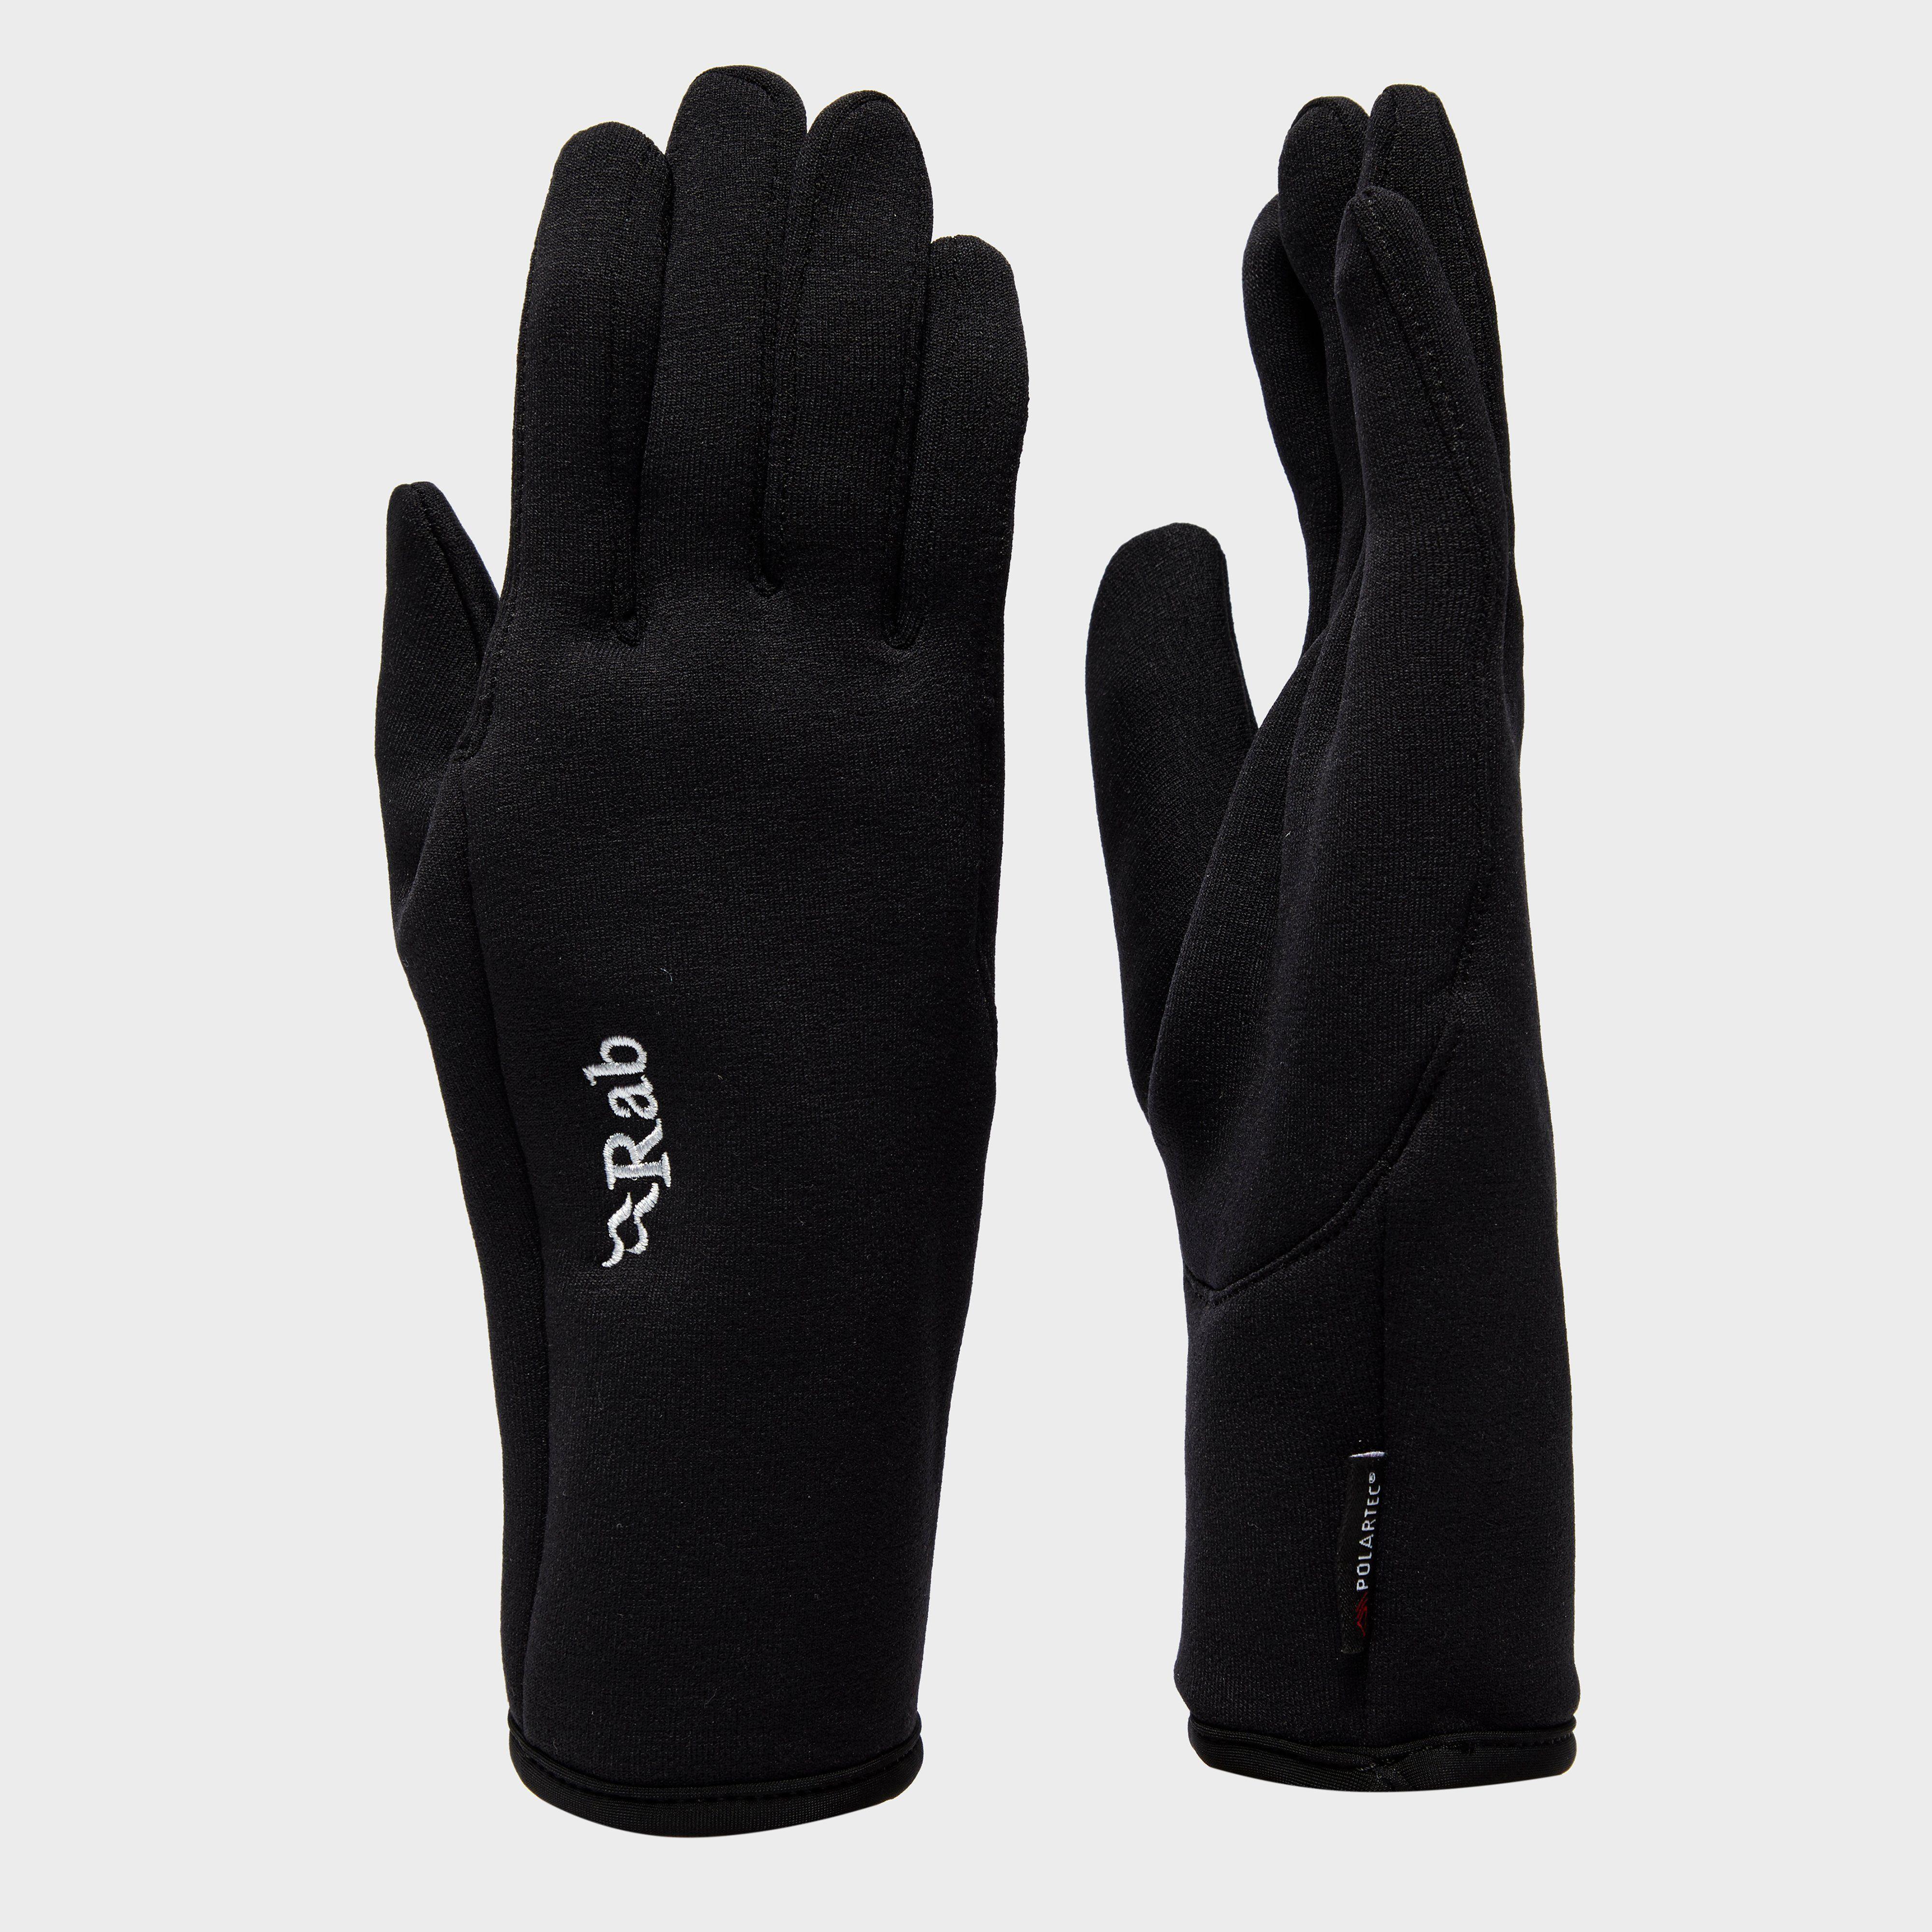 RAB Powerstretch Pro Glove